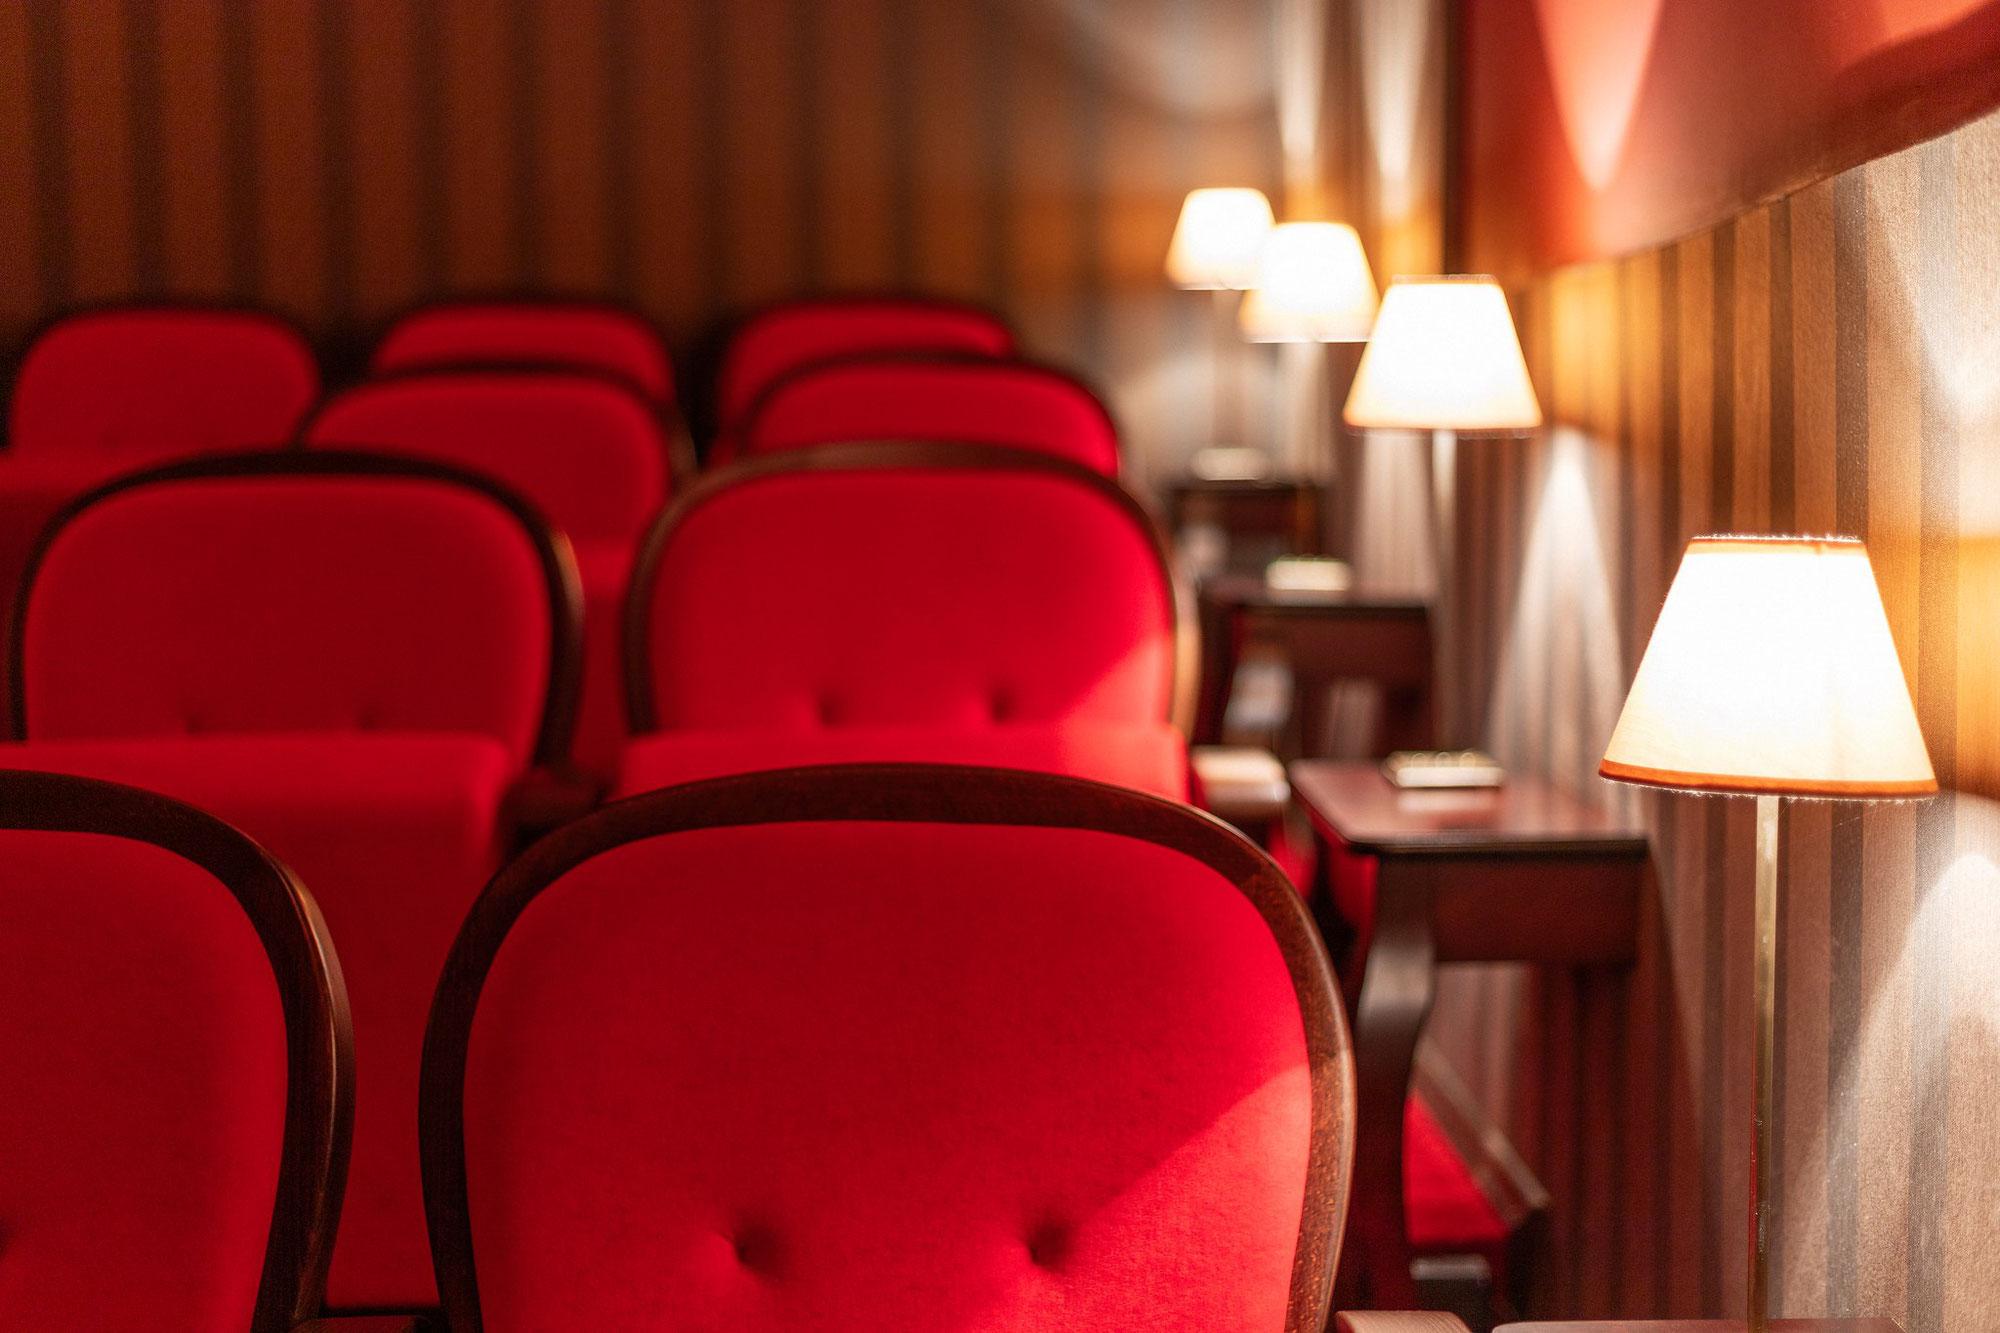 Fotos für die Kinos im Andreasstadel